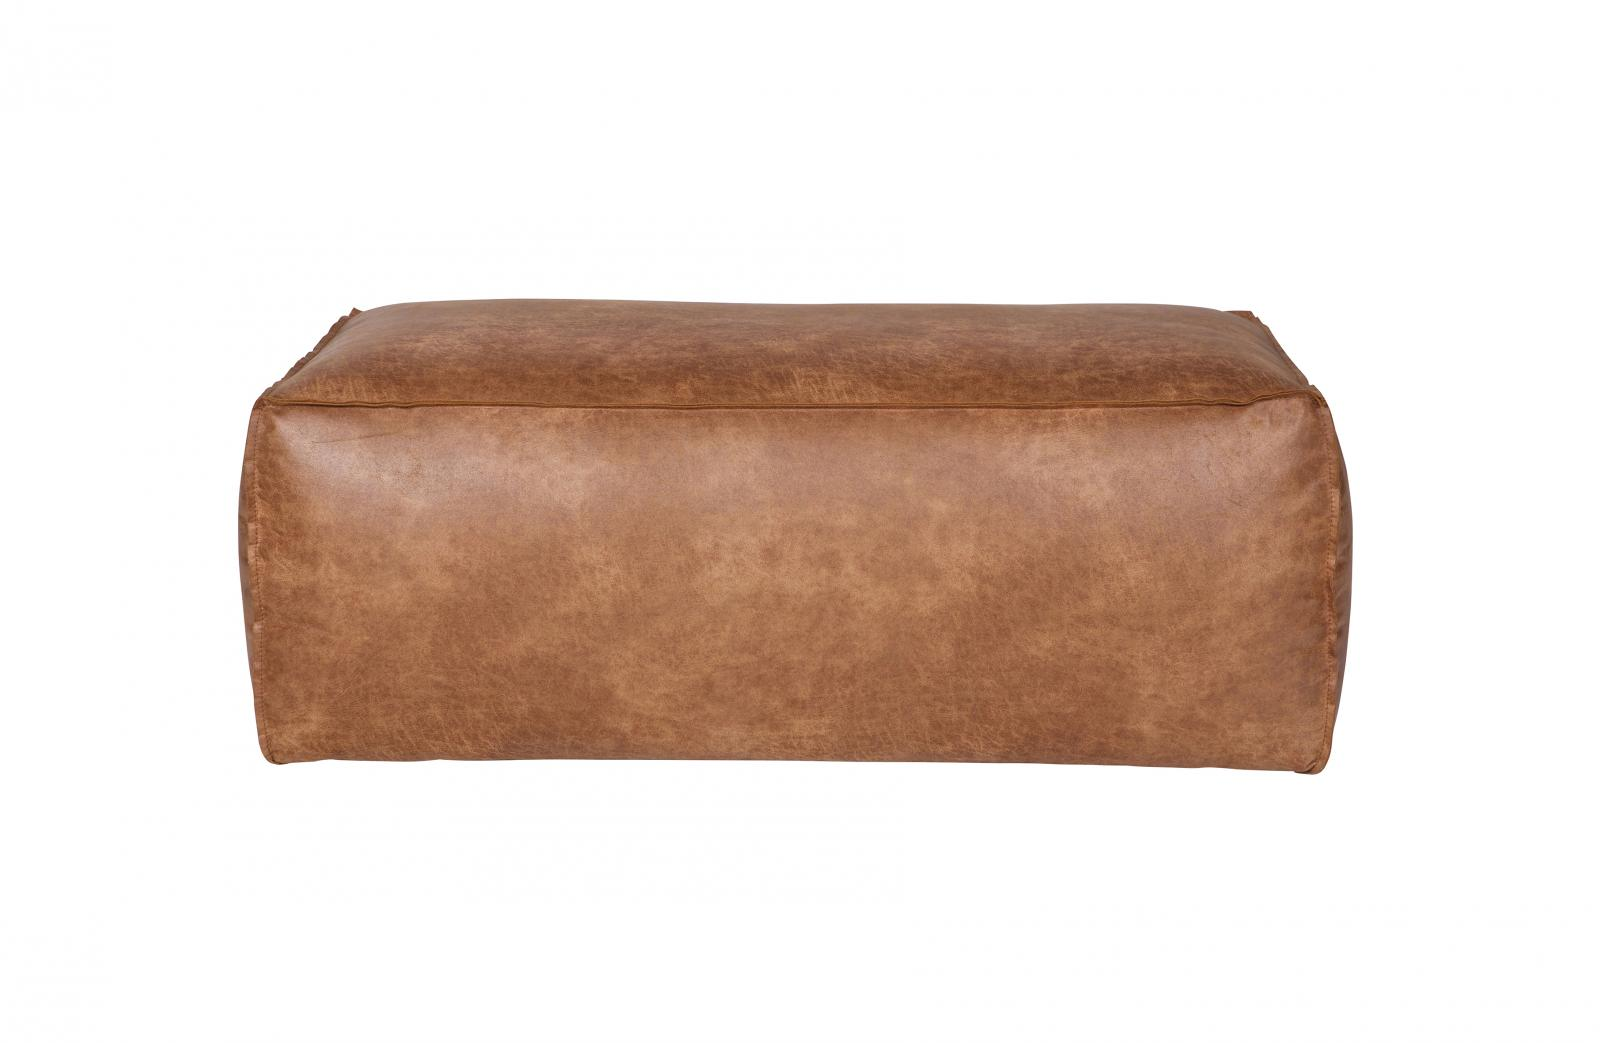 Bepurehome Rough Stoel : Bureaustoel leder cognac: esszimmerstuhl echtleder vintage rough